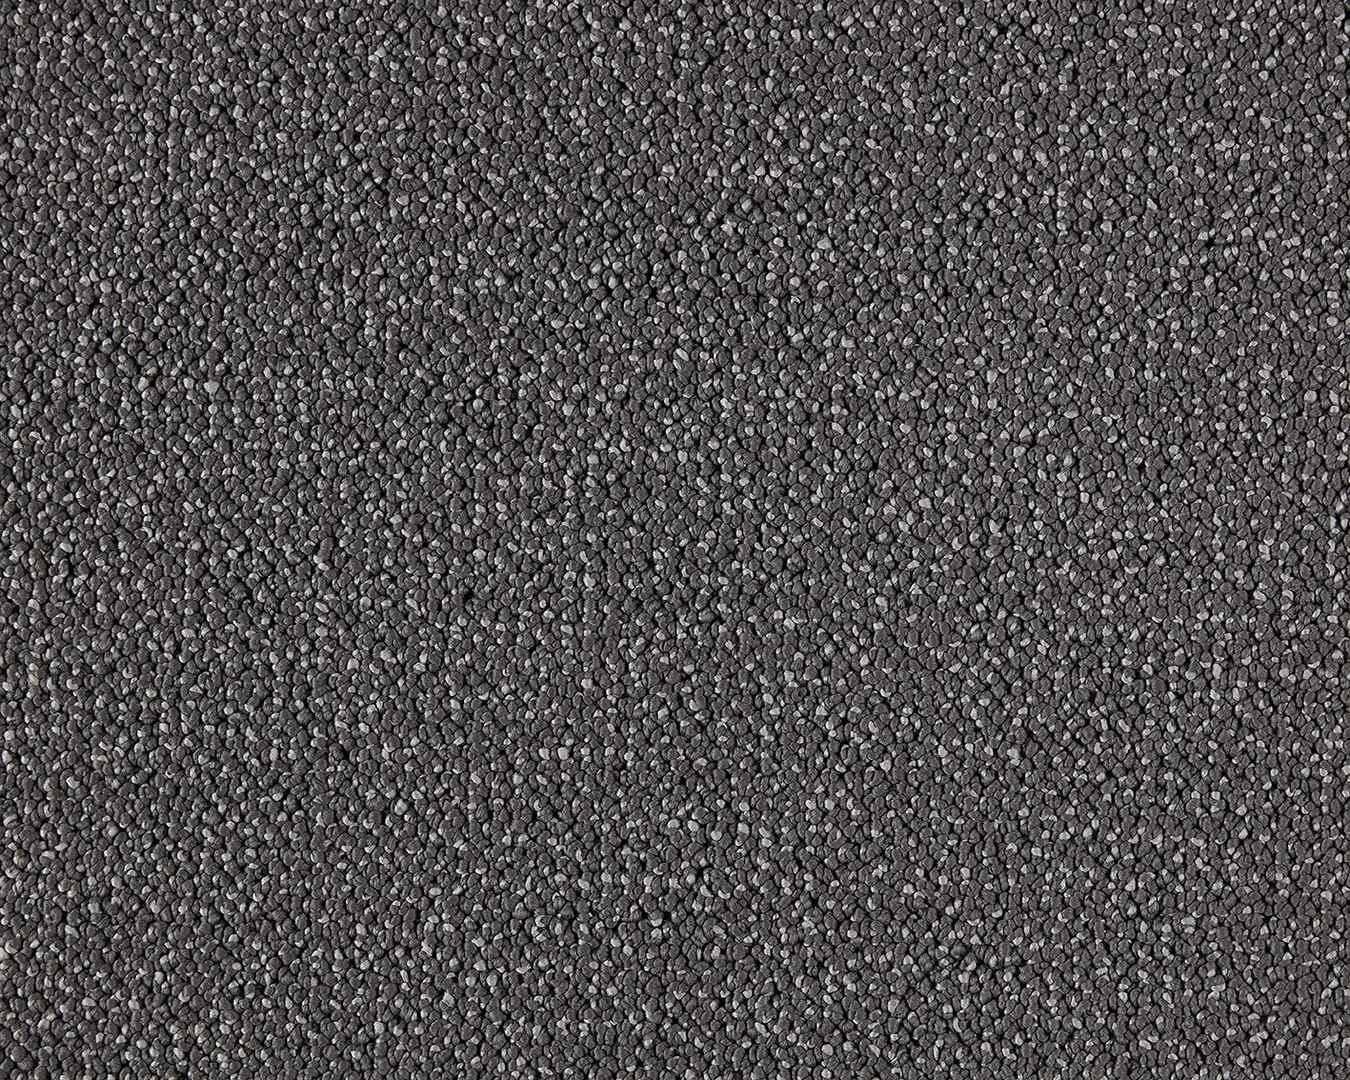 Wykładzina SmartStrand Moon UXO.820